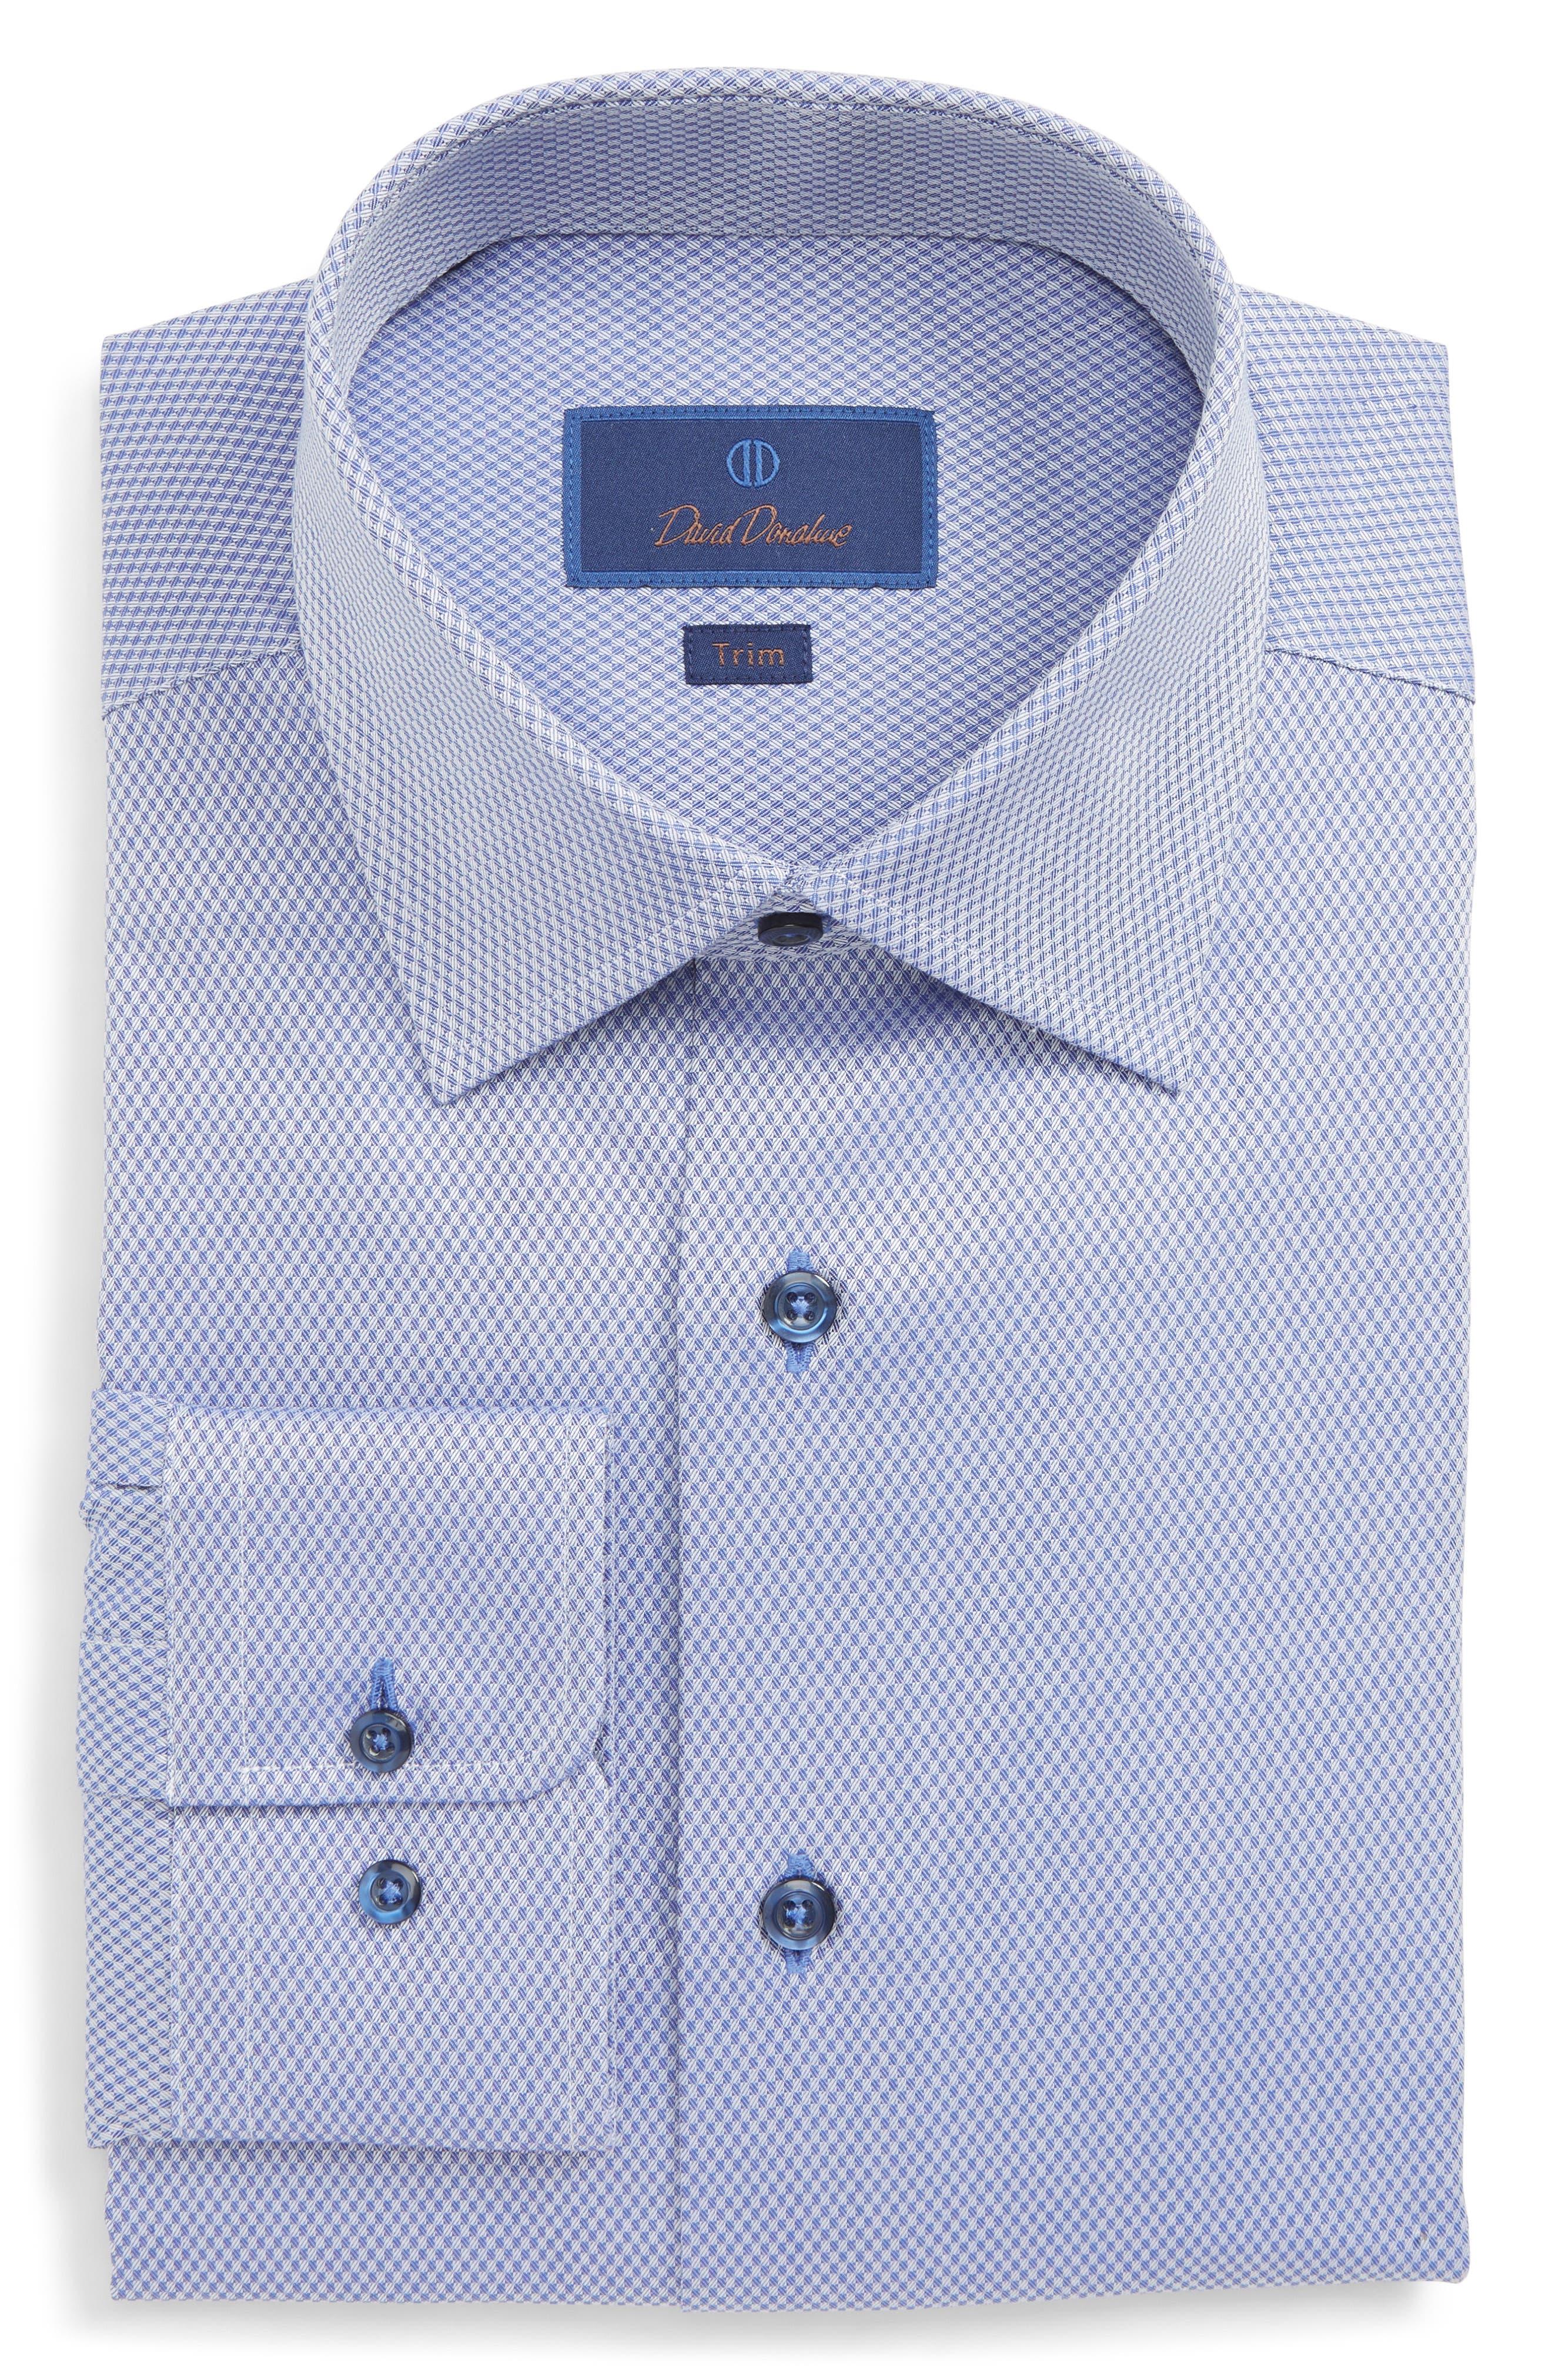 DAVID DONAHUE Men'S Trim-Fit Tonal Box Dress Shirt, Blue